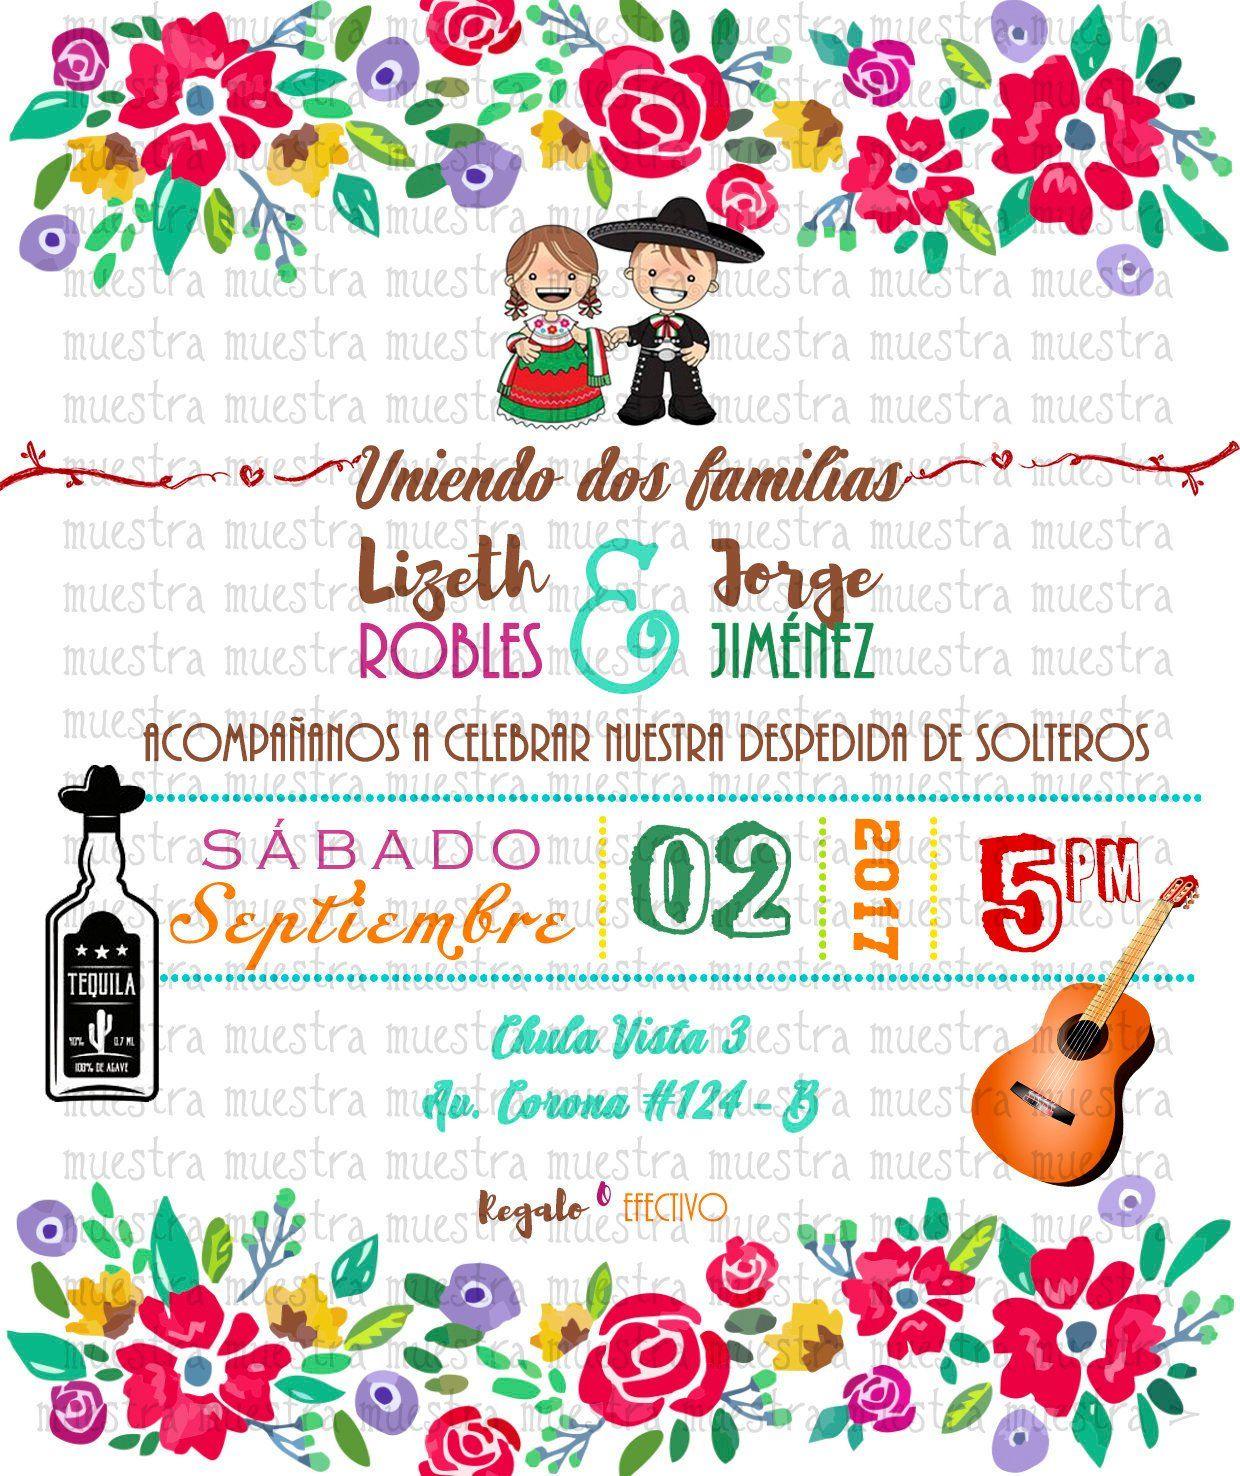 fiesta de solteros 2019 mexico